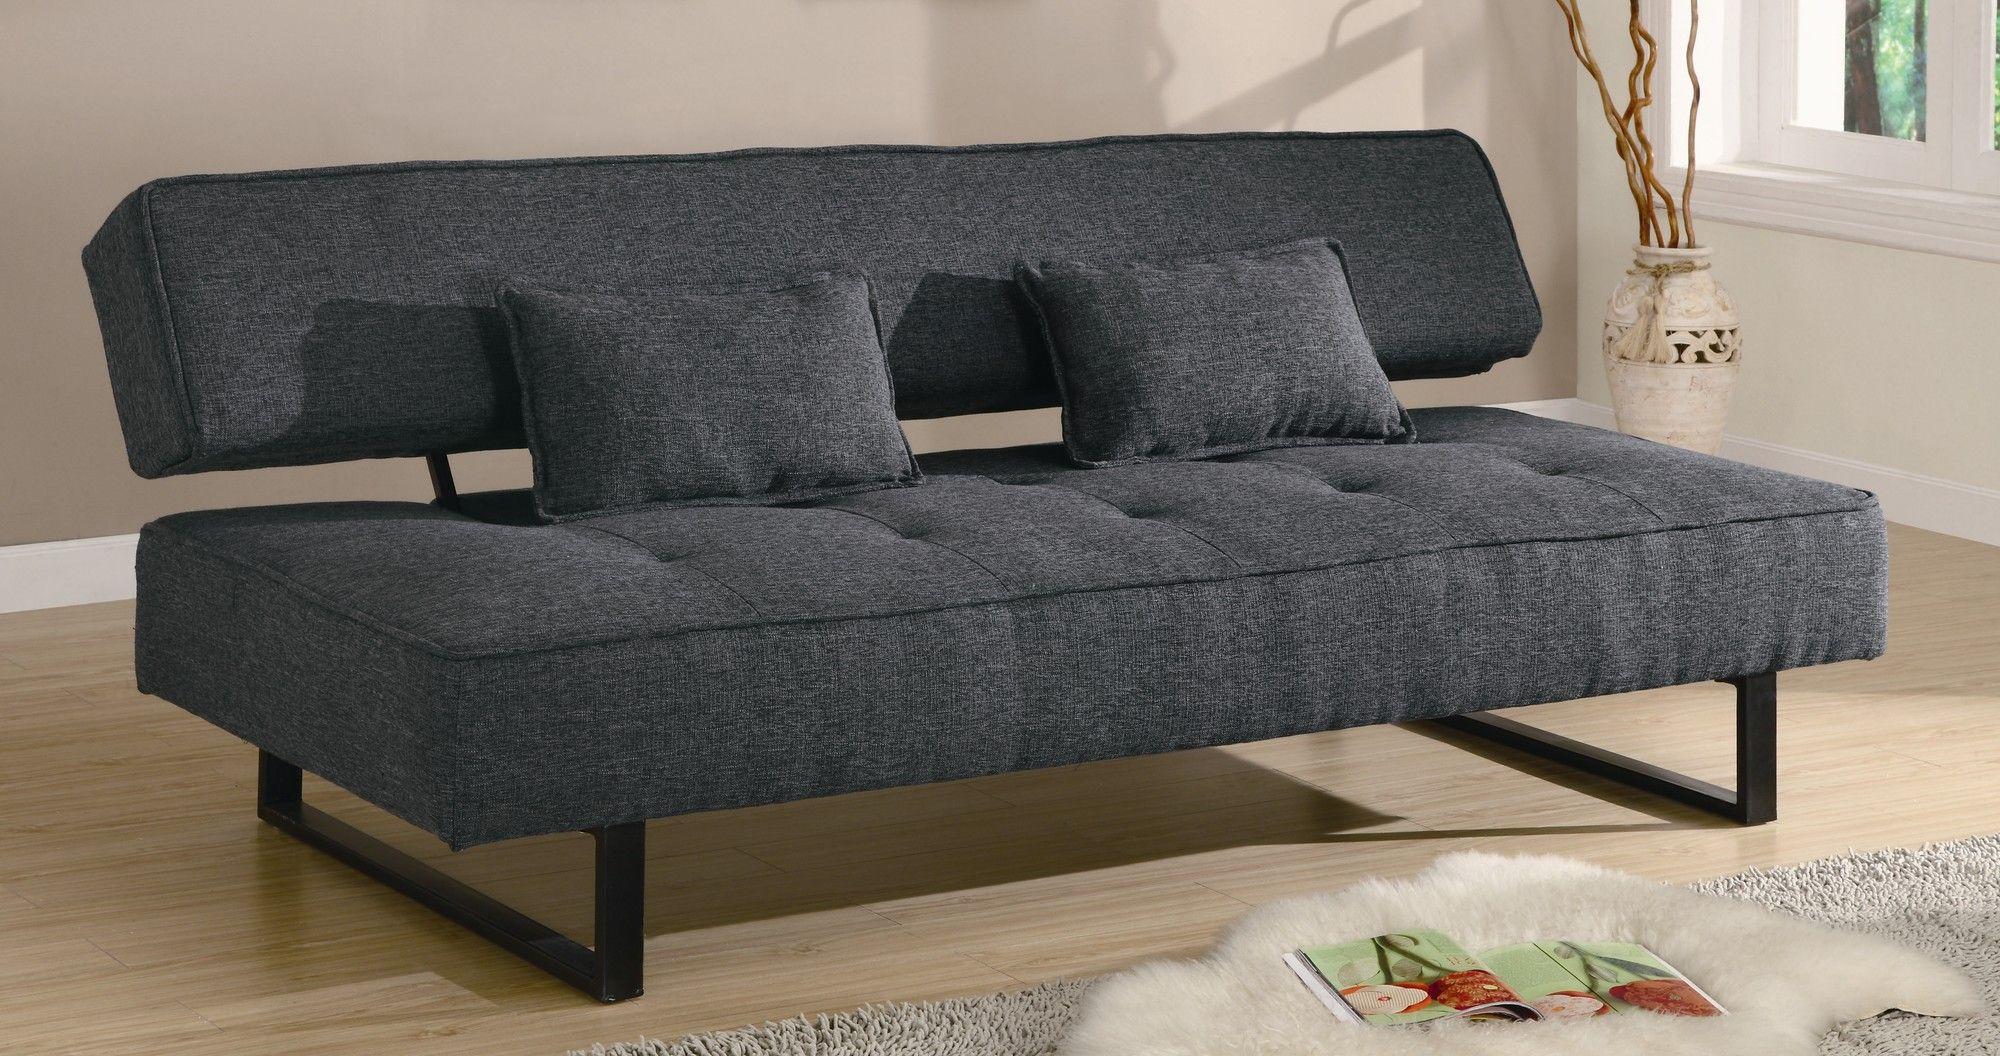 Gianna sleeper sofa products pinterest sleeper sofas and sofas